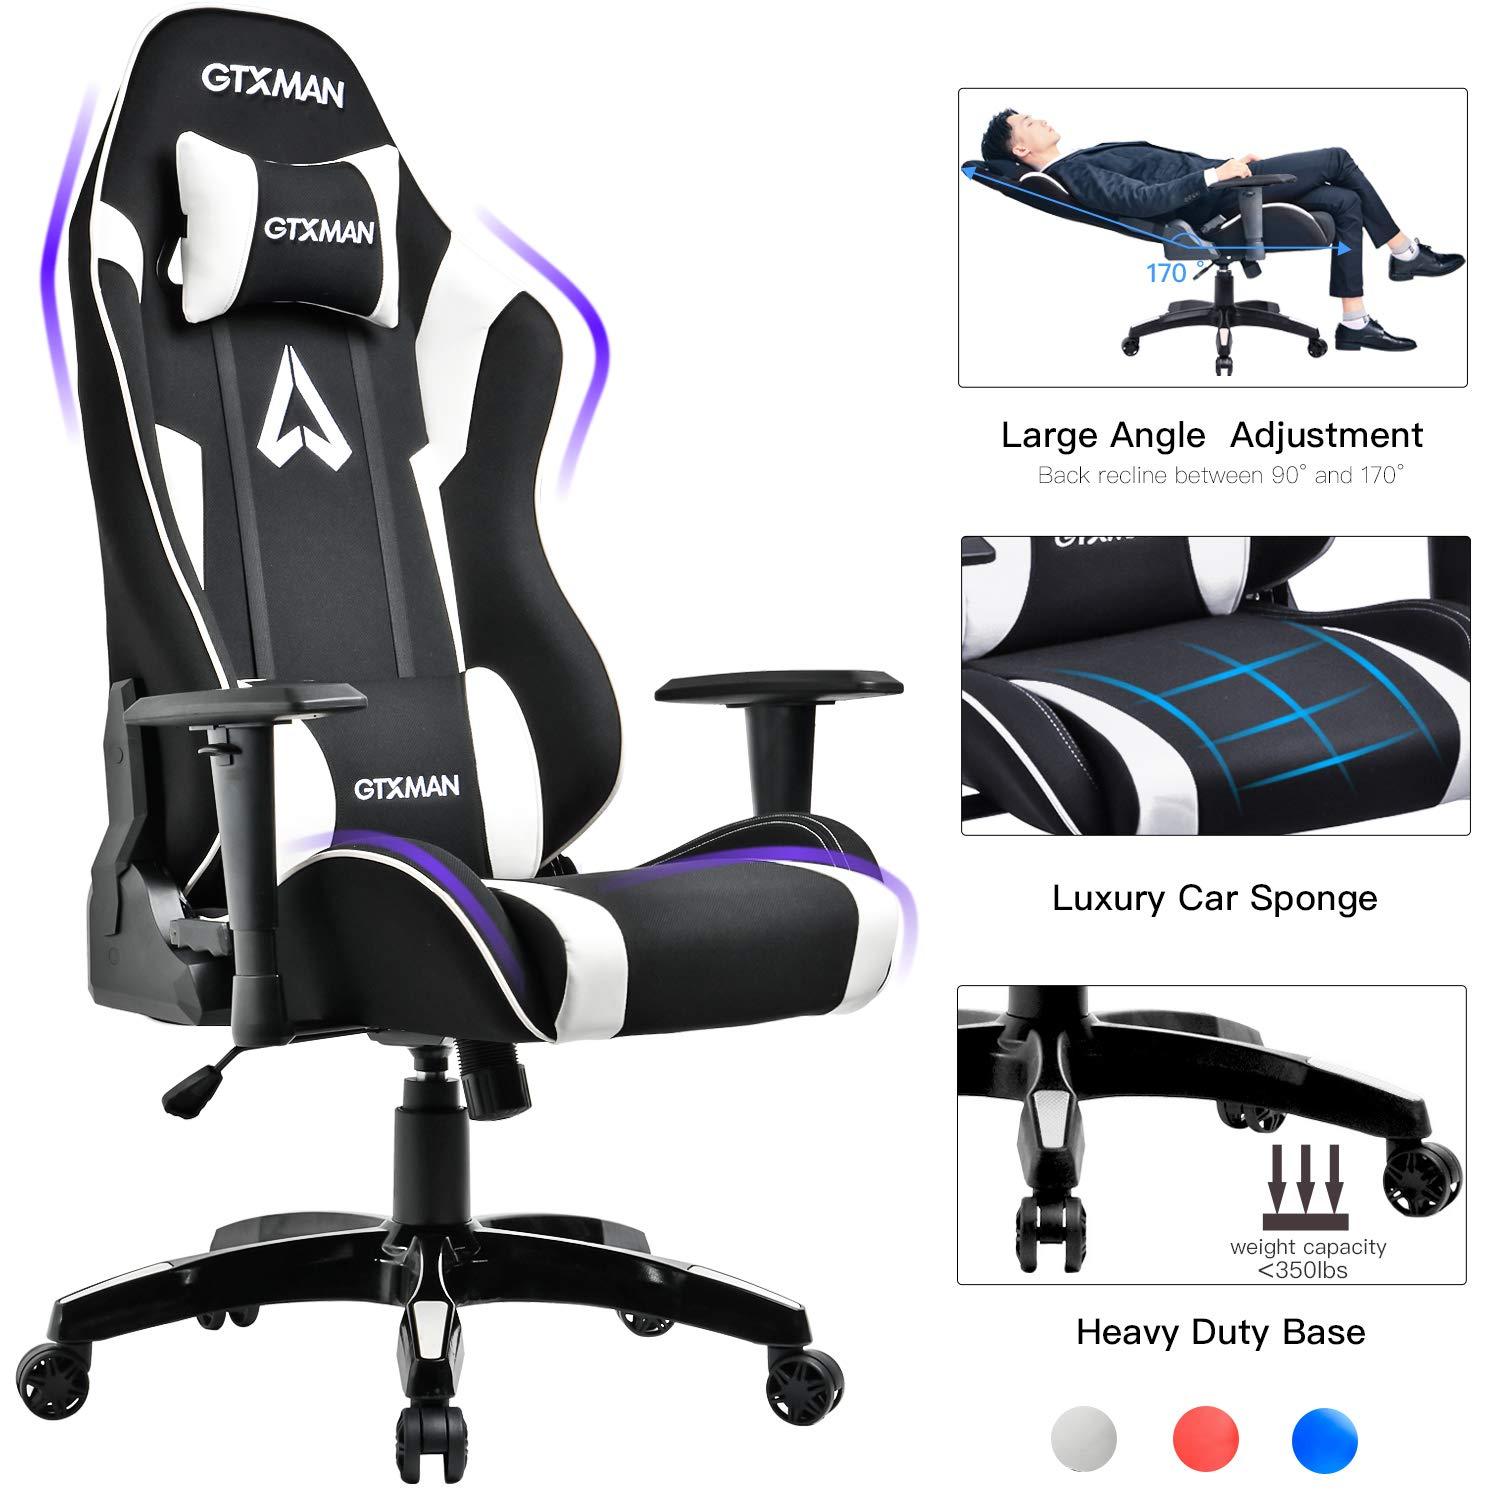 GTXMAN Gaming Chair Racing Style Office Chair Video Game Chair Breathable Mesh Chair Ergonomic Heavy Duty 350lbs Esports Chair White by GTXMAN